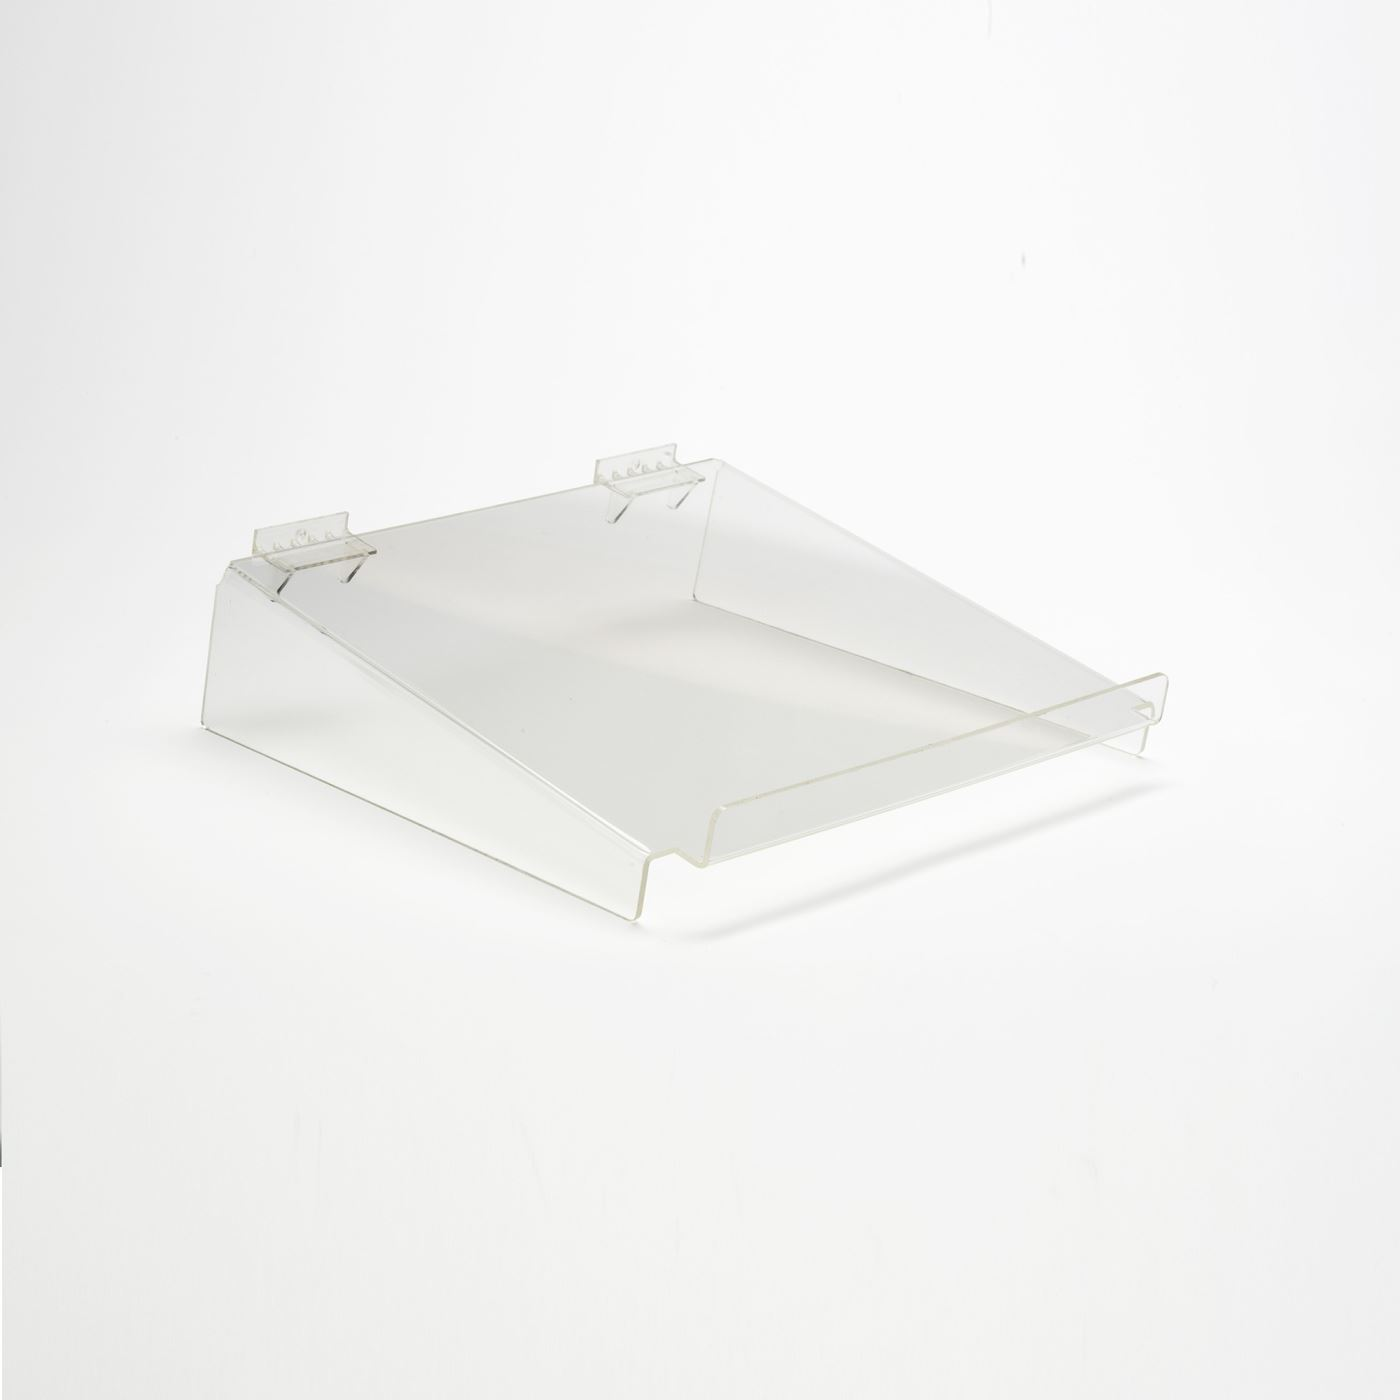 General Purpose Slat Fix Shelf with Supports & Upstand